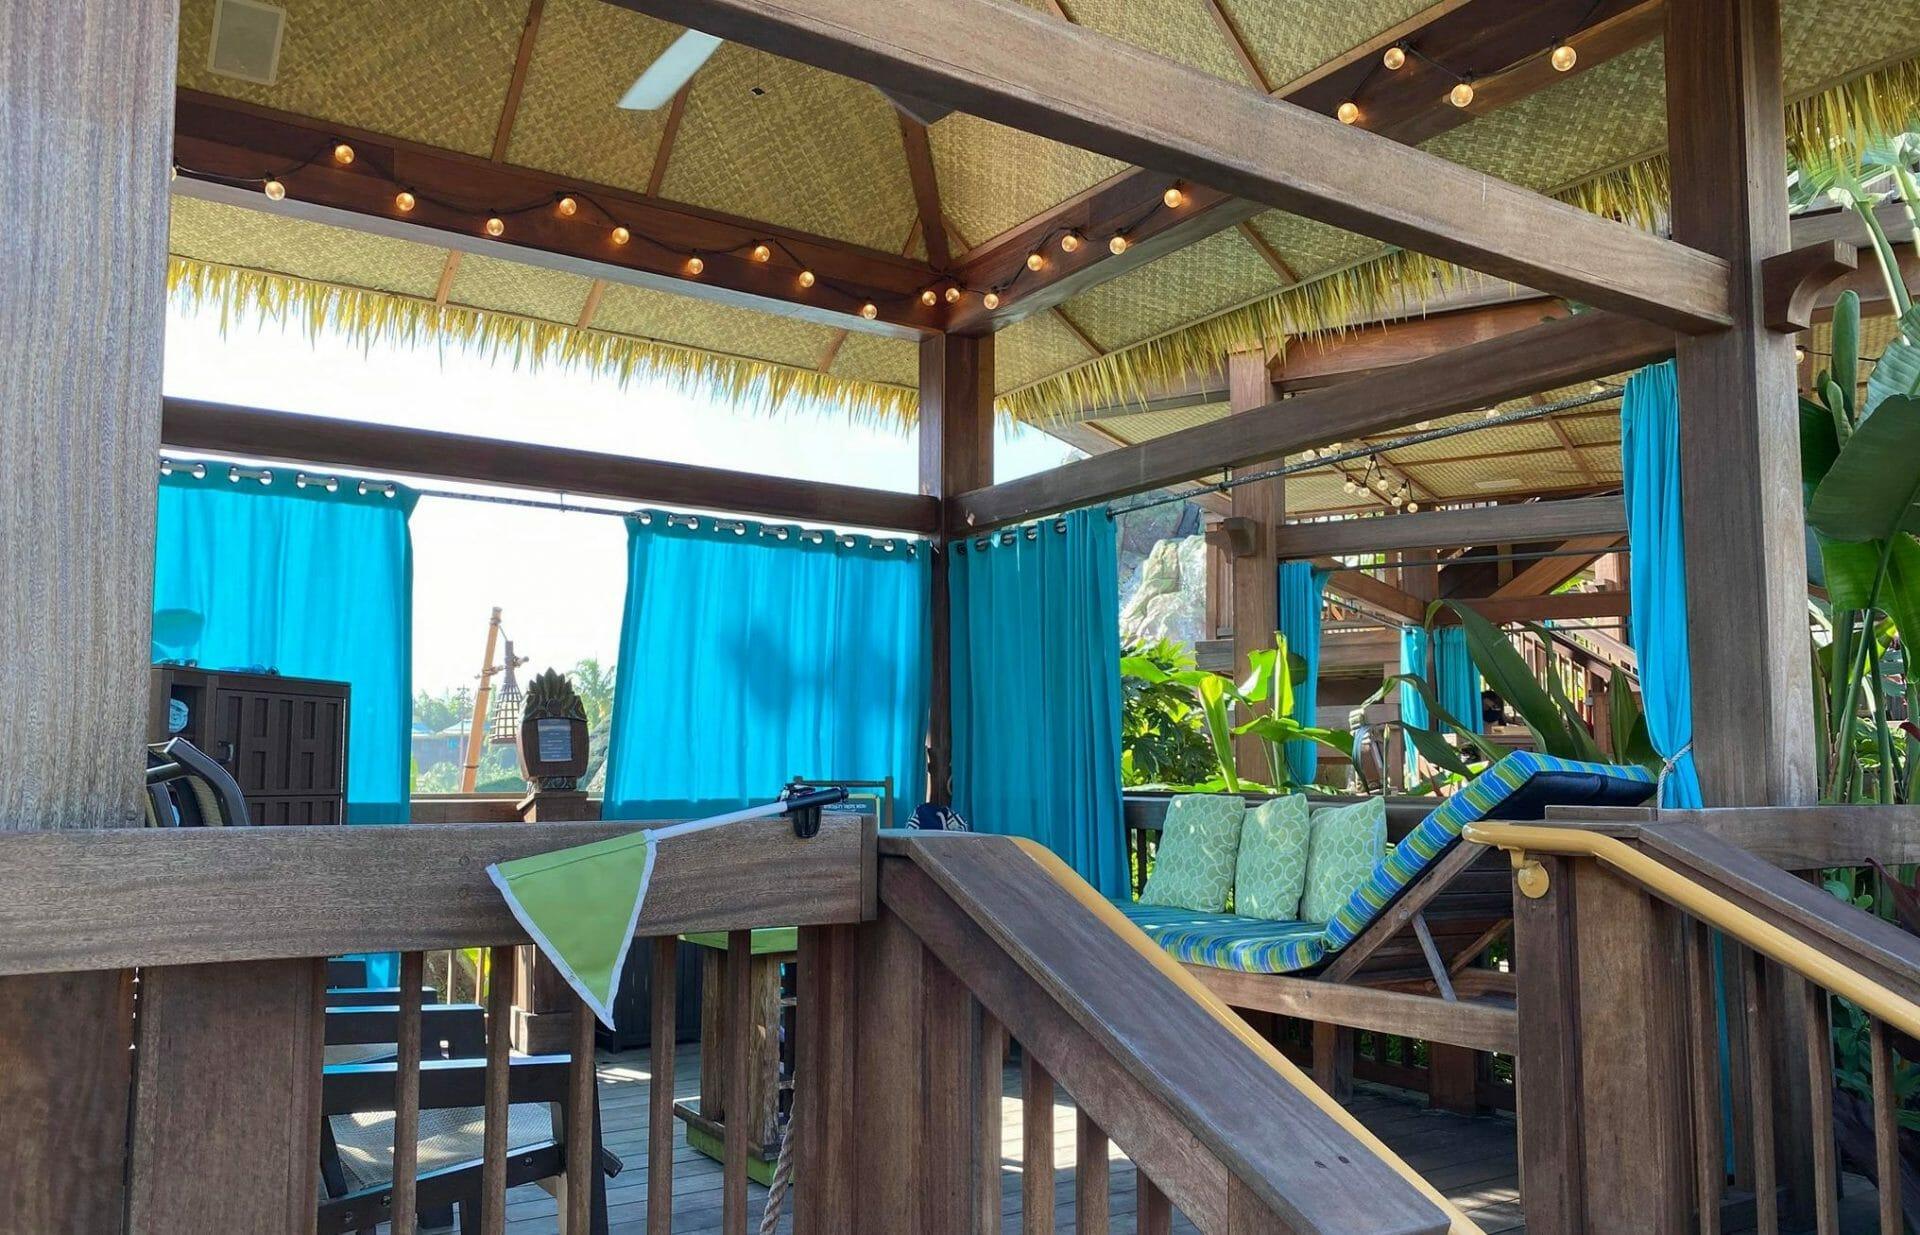 Universal's Volcano Bay Private Cabanas 101